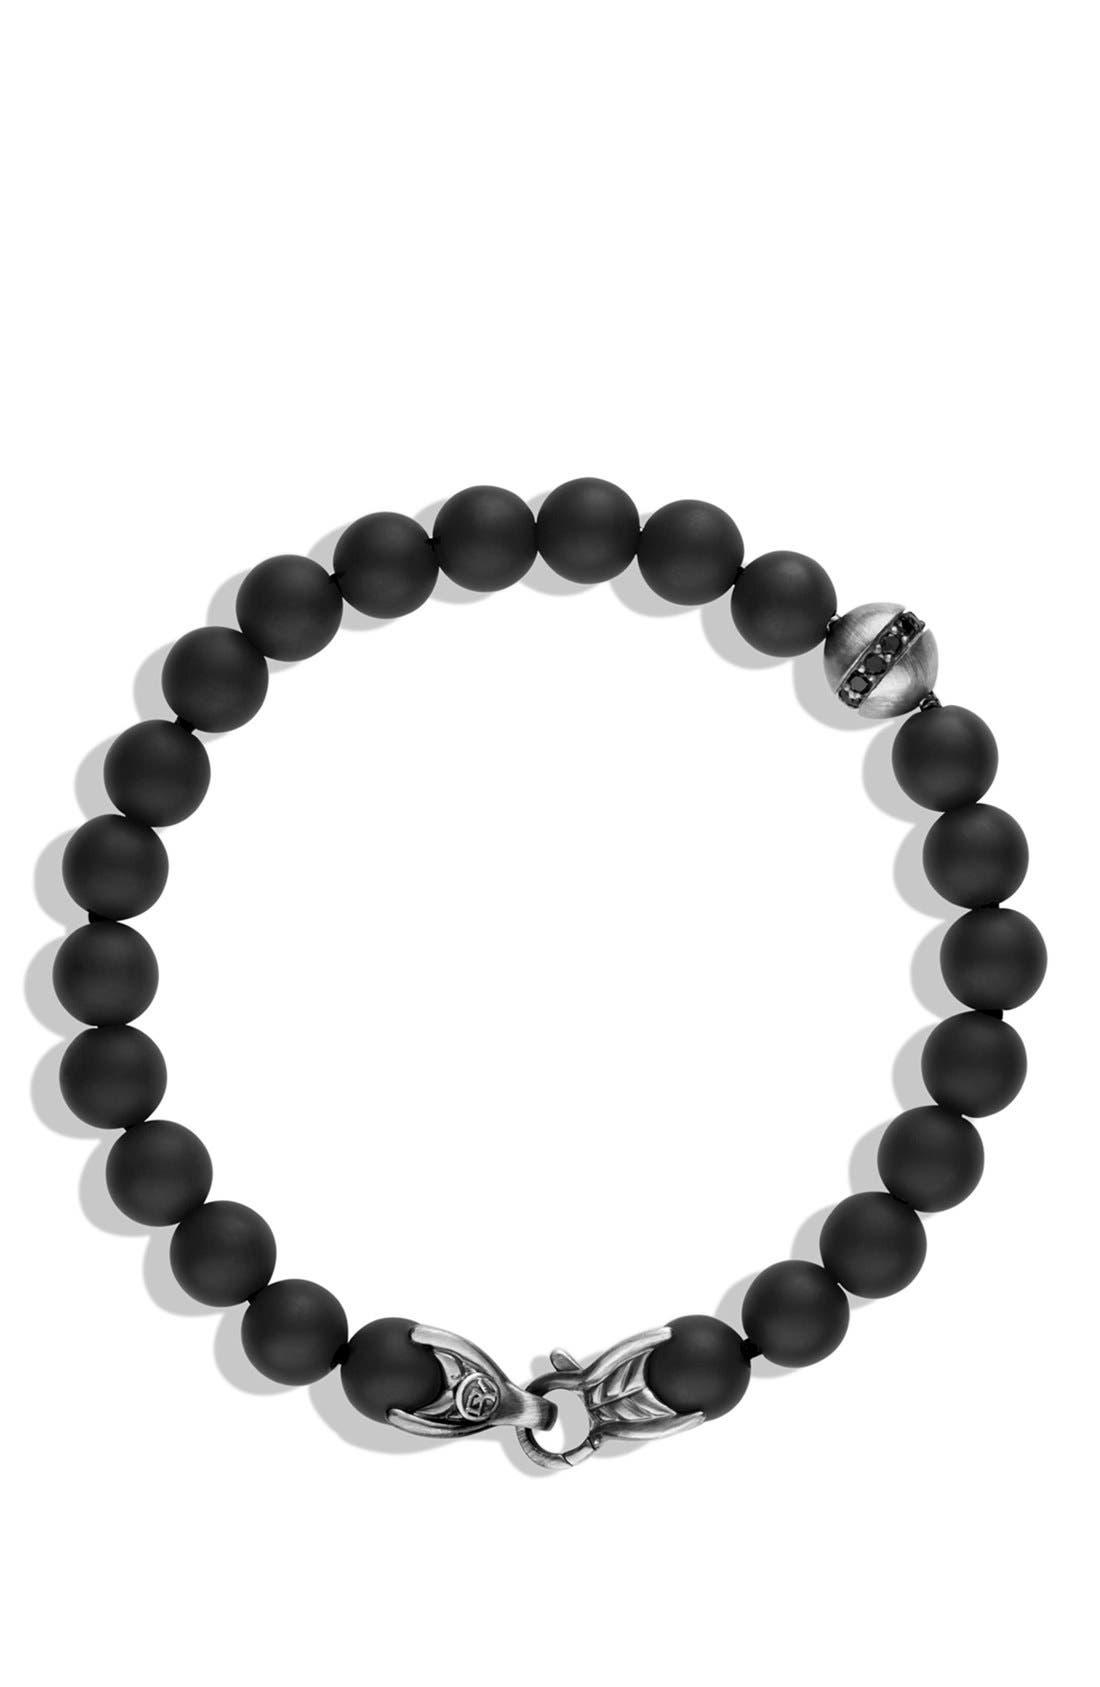 'Spiritual Beads' Bracelet with Black Onyx and Black Diamonds,                             Alternate thumbnail 2, color,                             BLACK ONYX